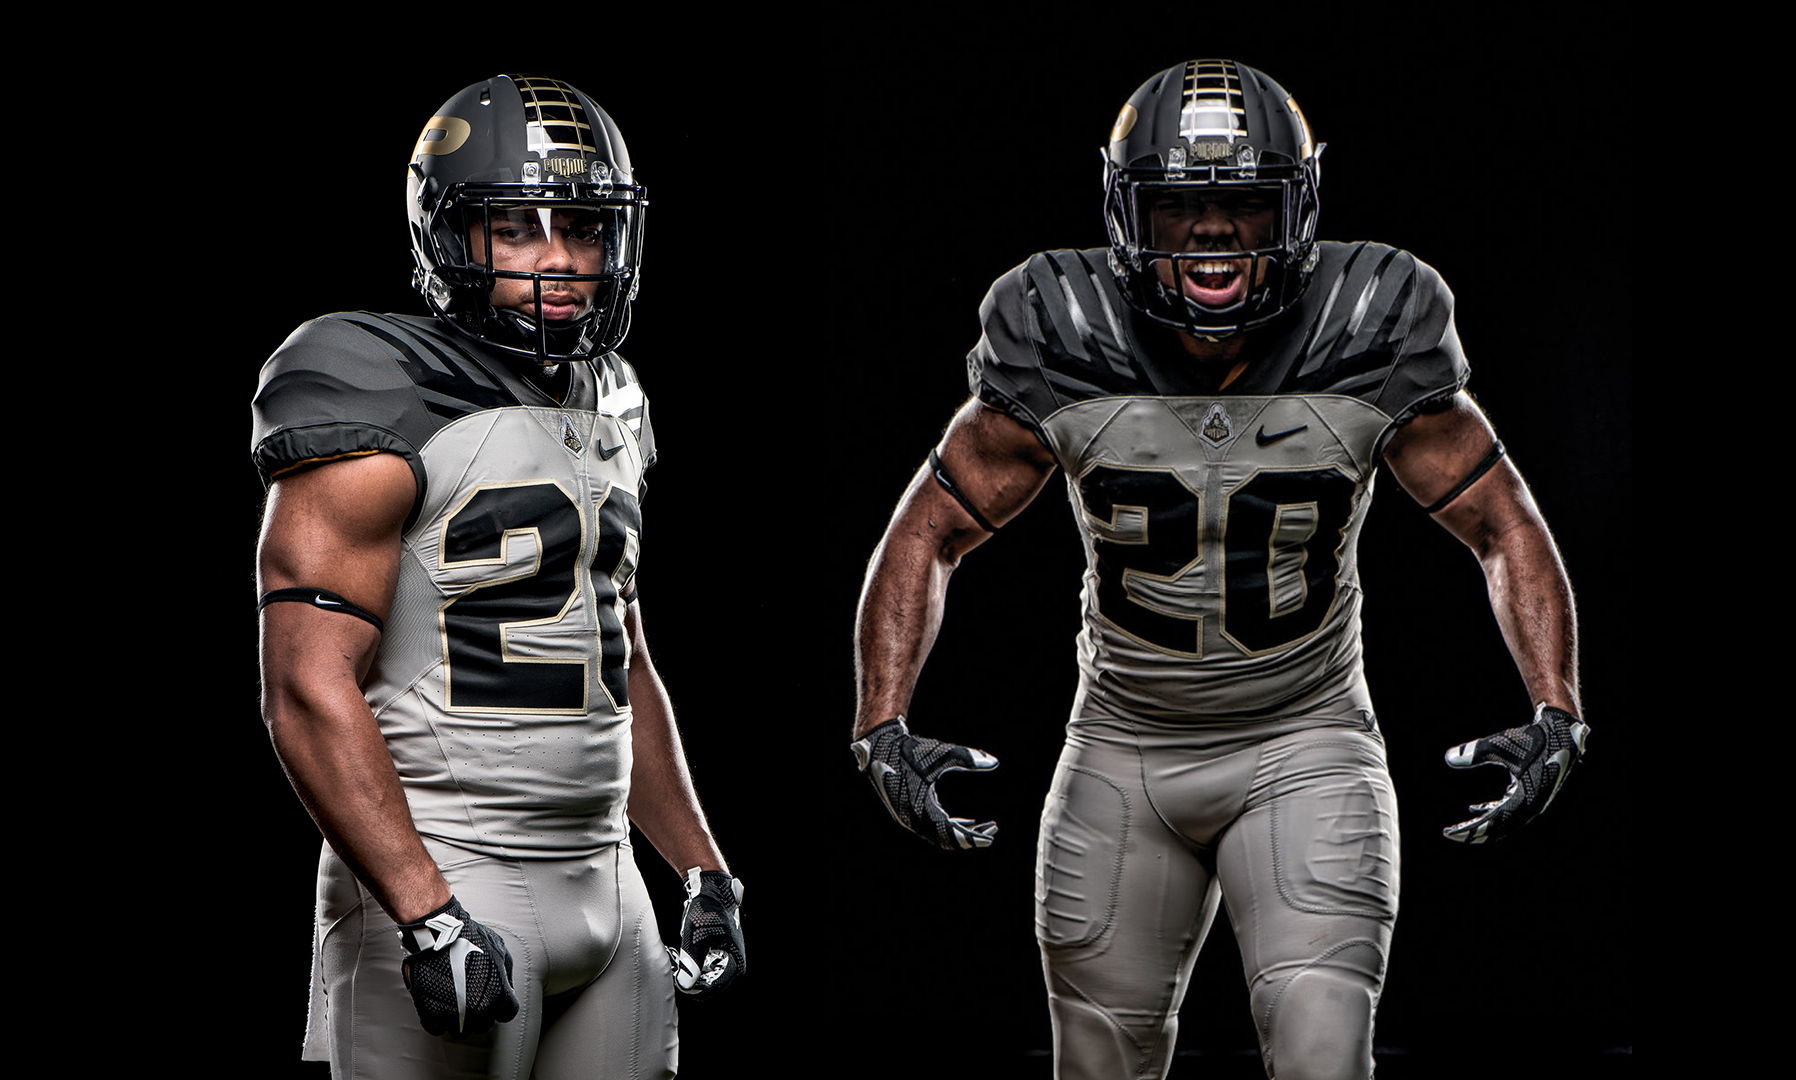 Custom Football Uniforms and Jerseys - Design